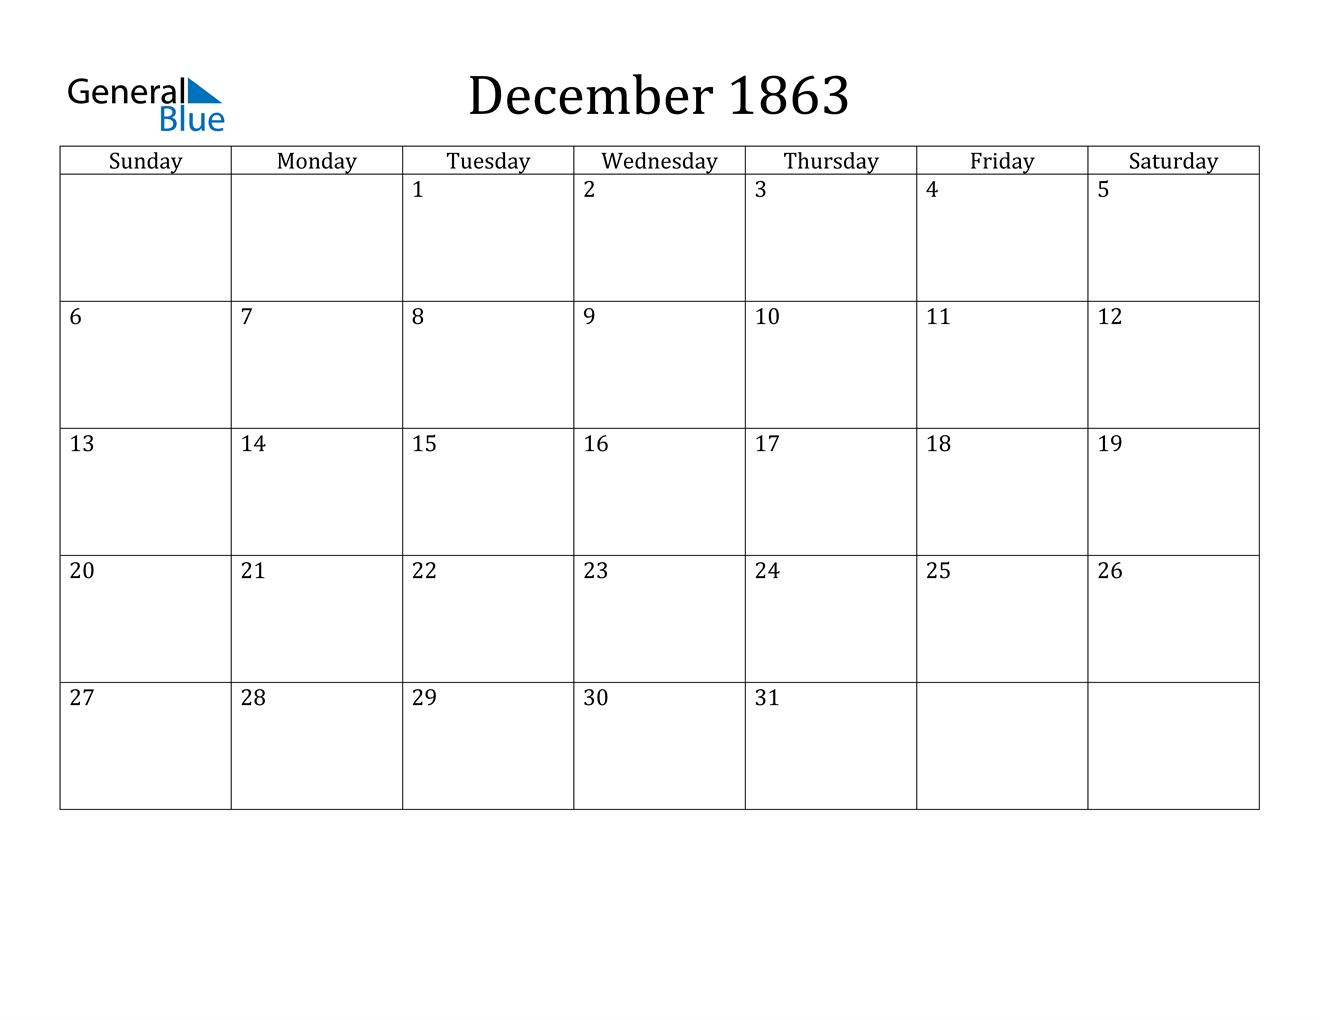 Image of December 1863 Calendar